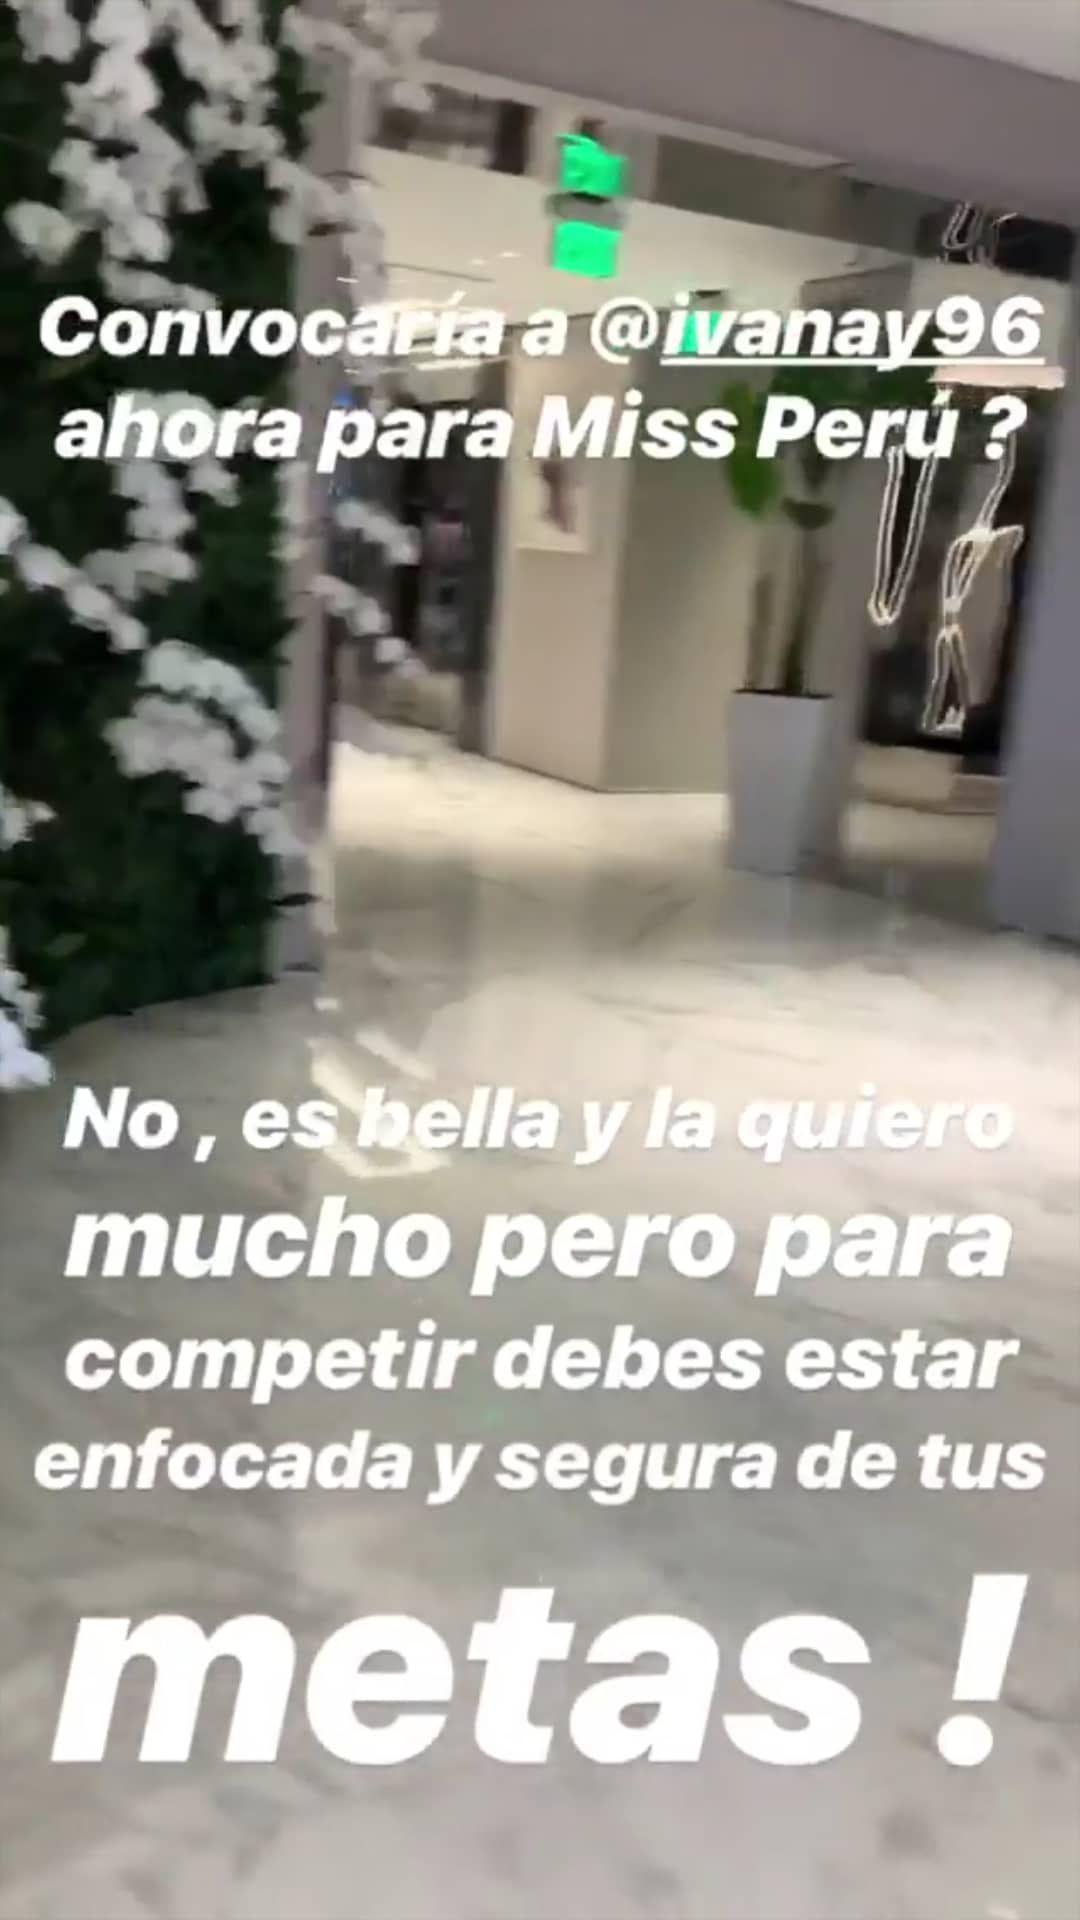 Jessica Newton revela las razones por las que no convocará a Ivana Yturbe al Miss Perú. (Foto: @jessica.newton.777)